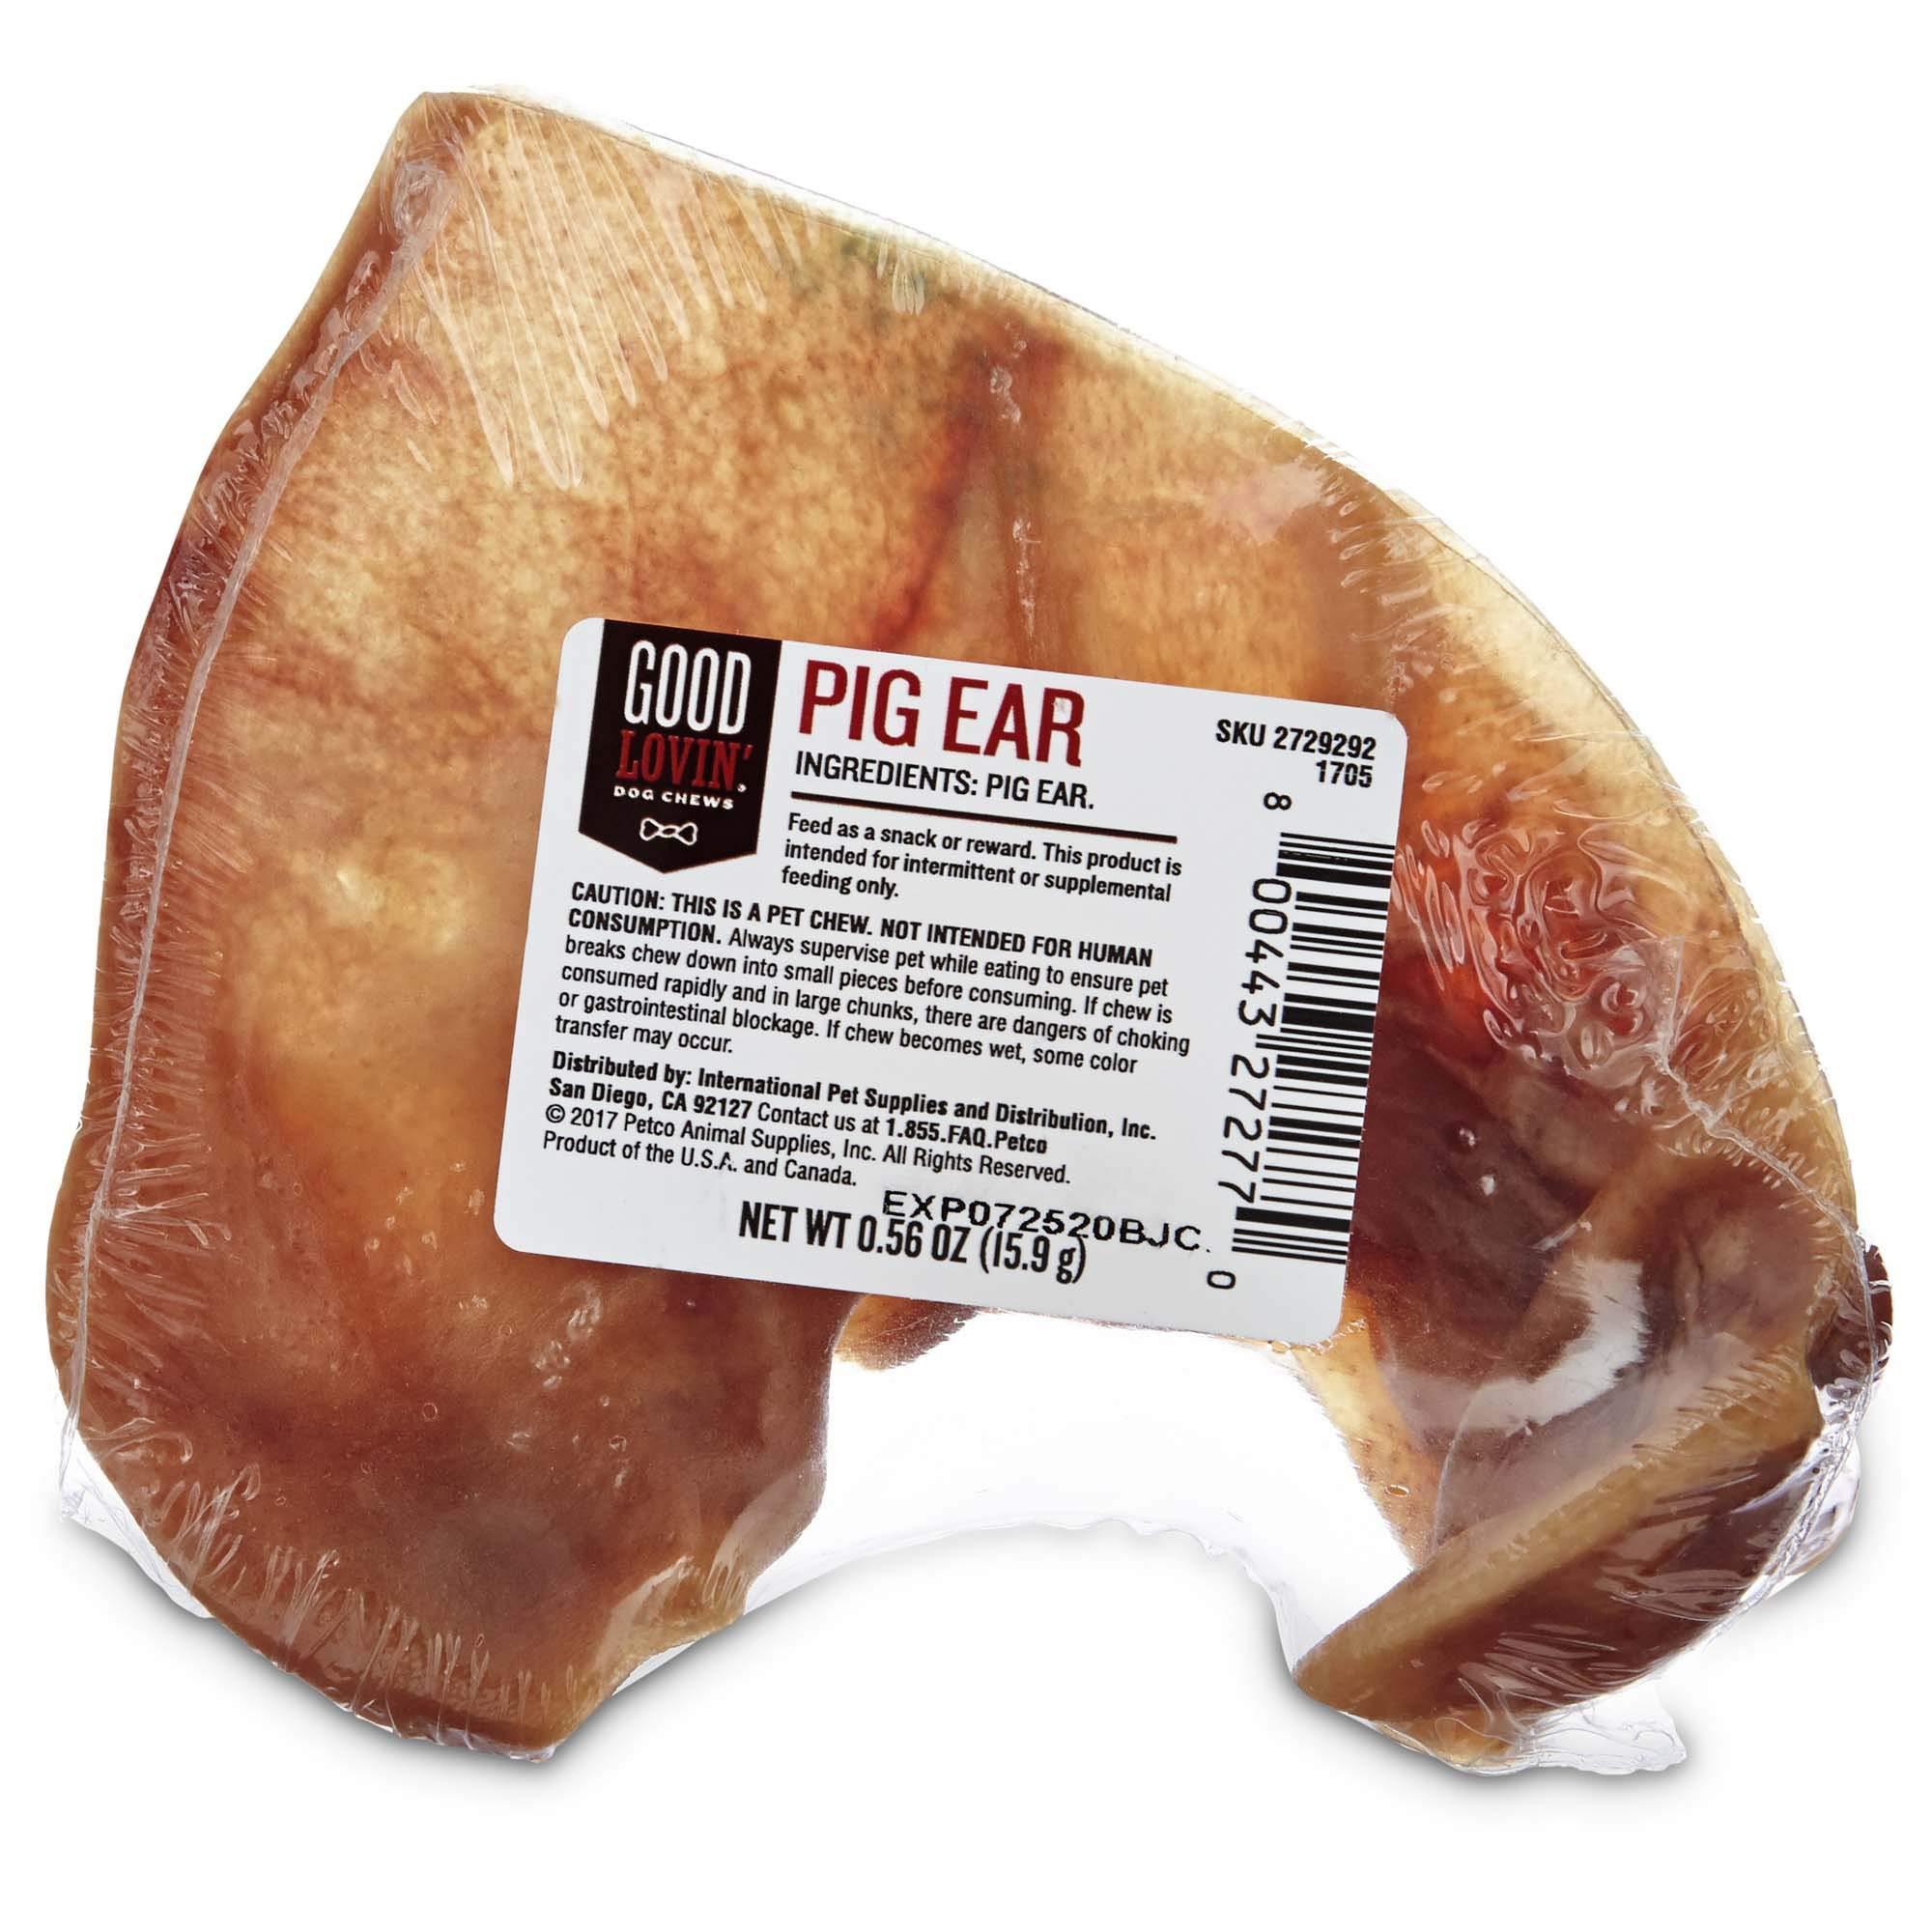 Good Lovin' Pig Ear Dog Chew, 0.56 oz, Pack of 1